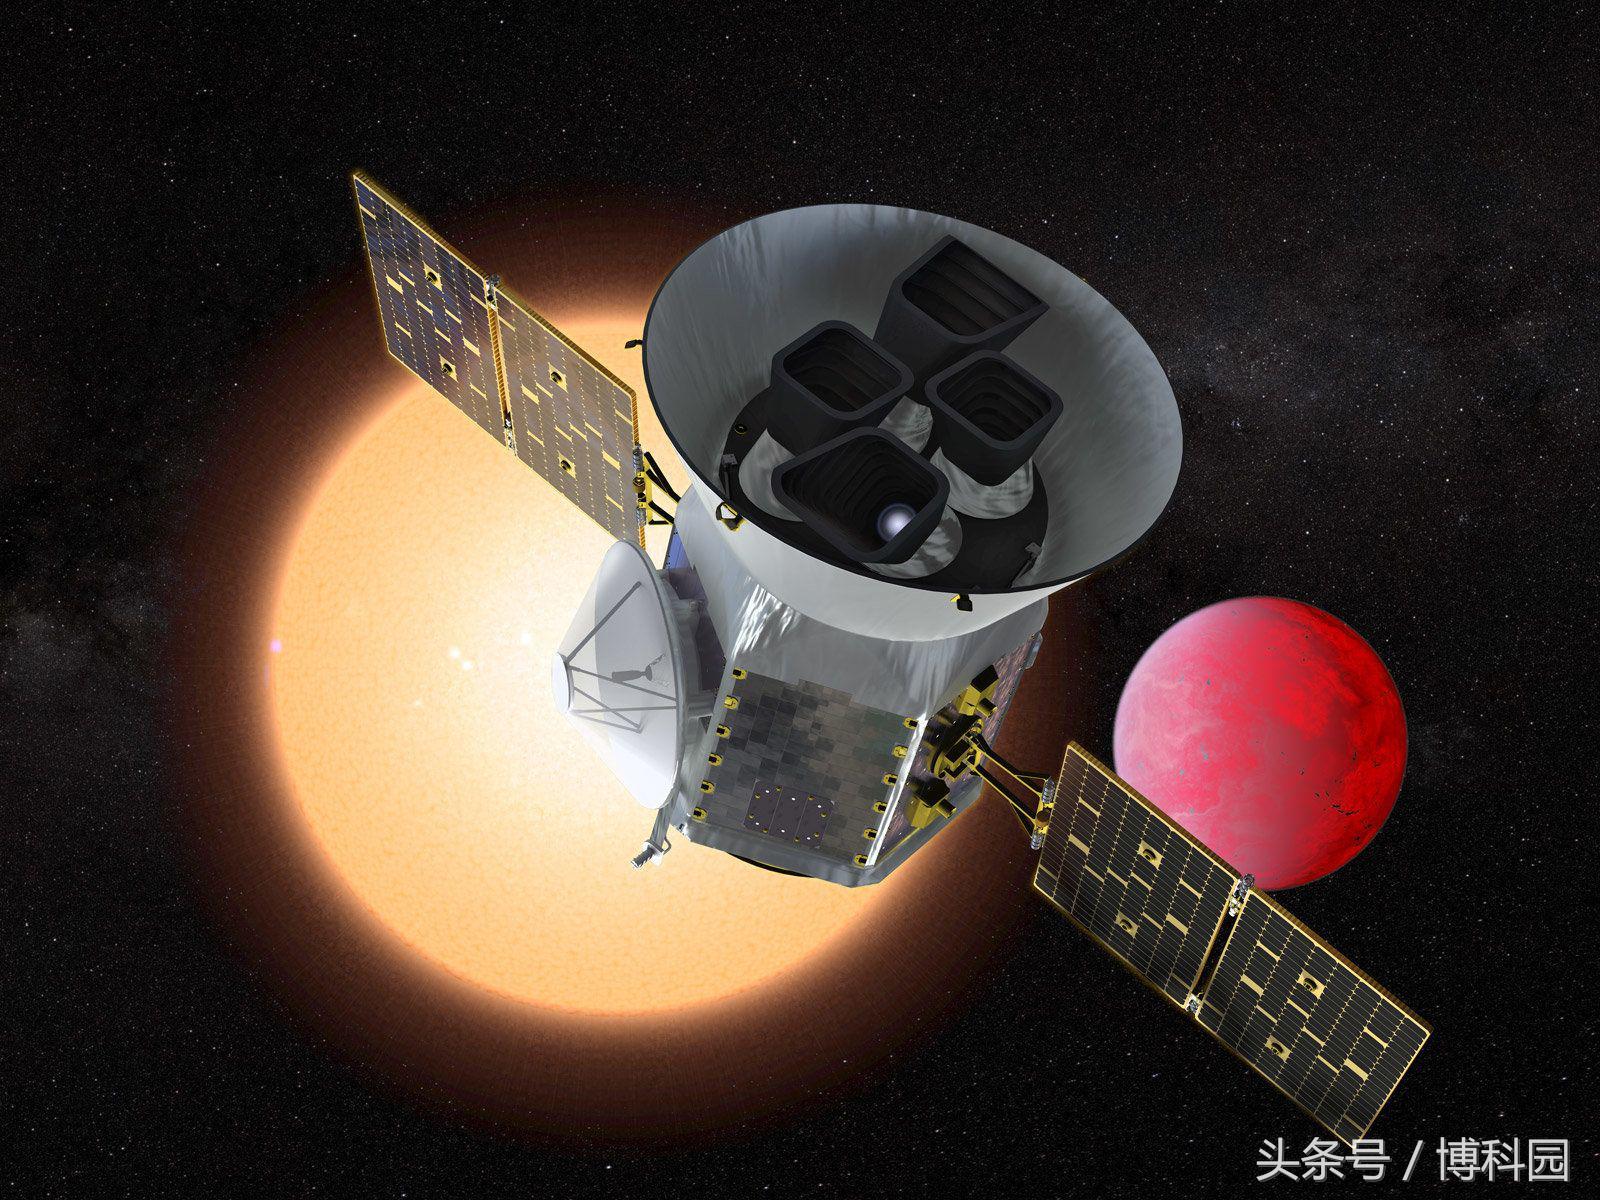 NASA准备发射新卫星:搜索宇宙、寻找新的世界